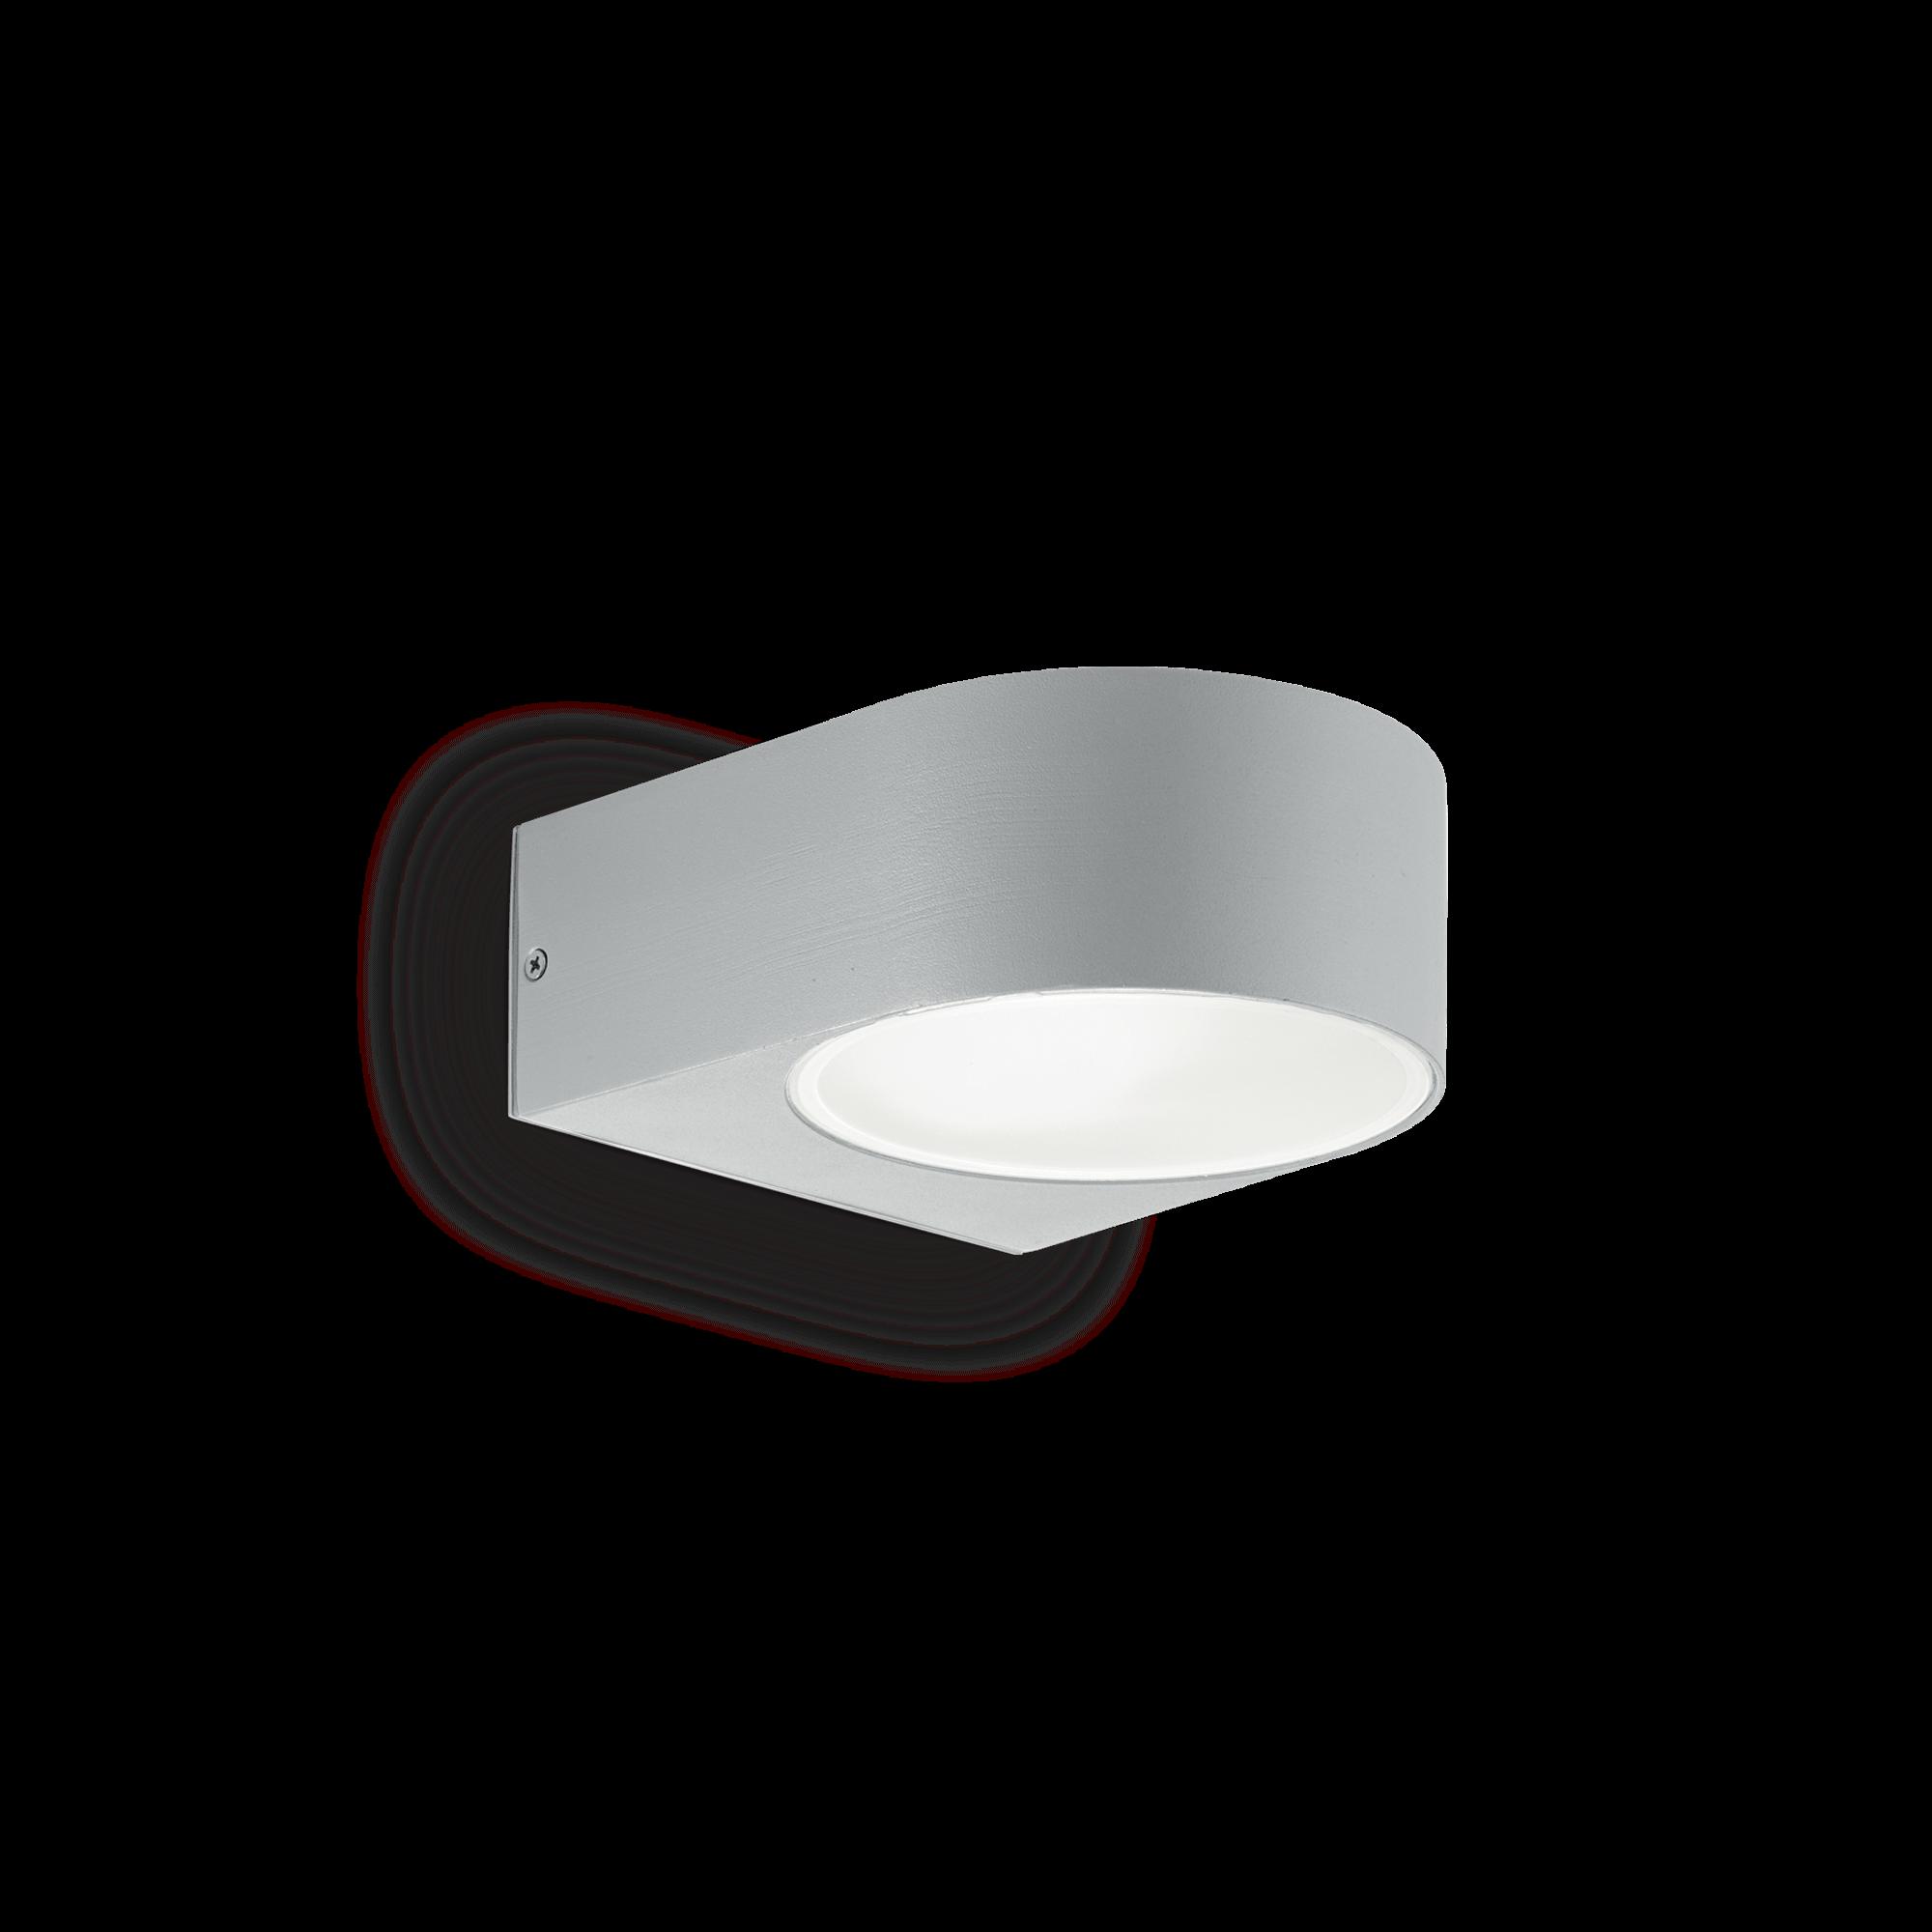 Ideal Lux 092218 Iko AP1 Grigio kerti falilámpa